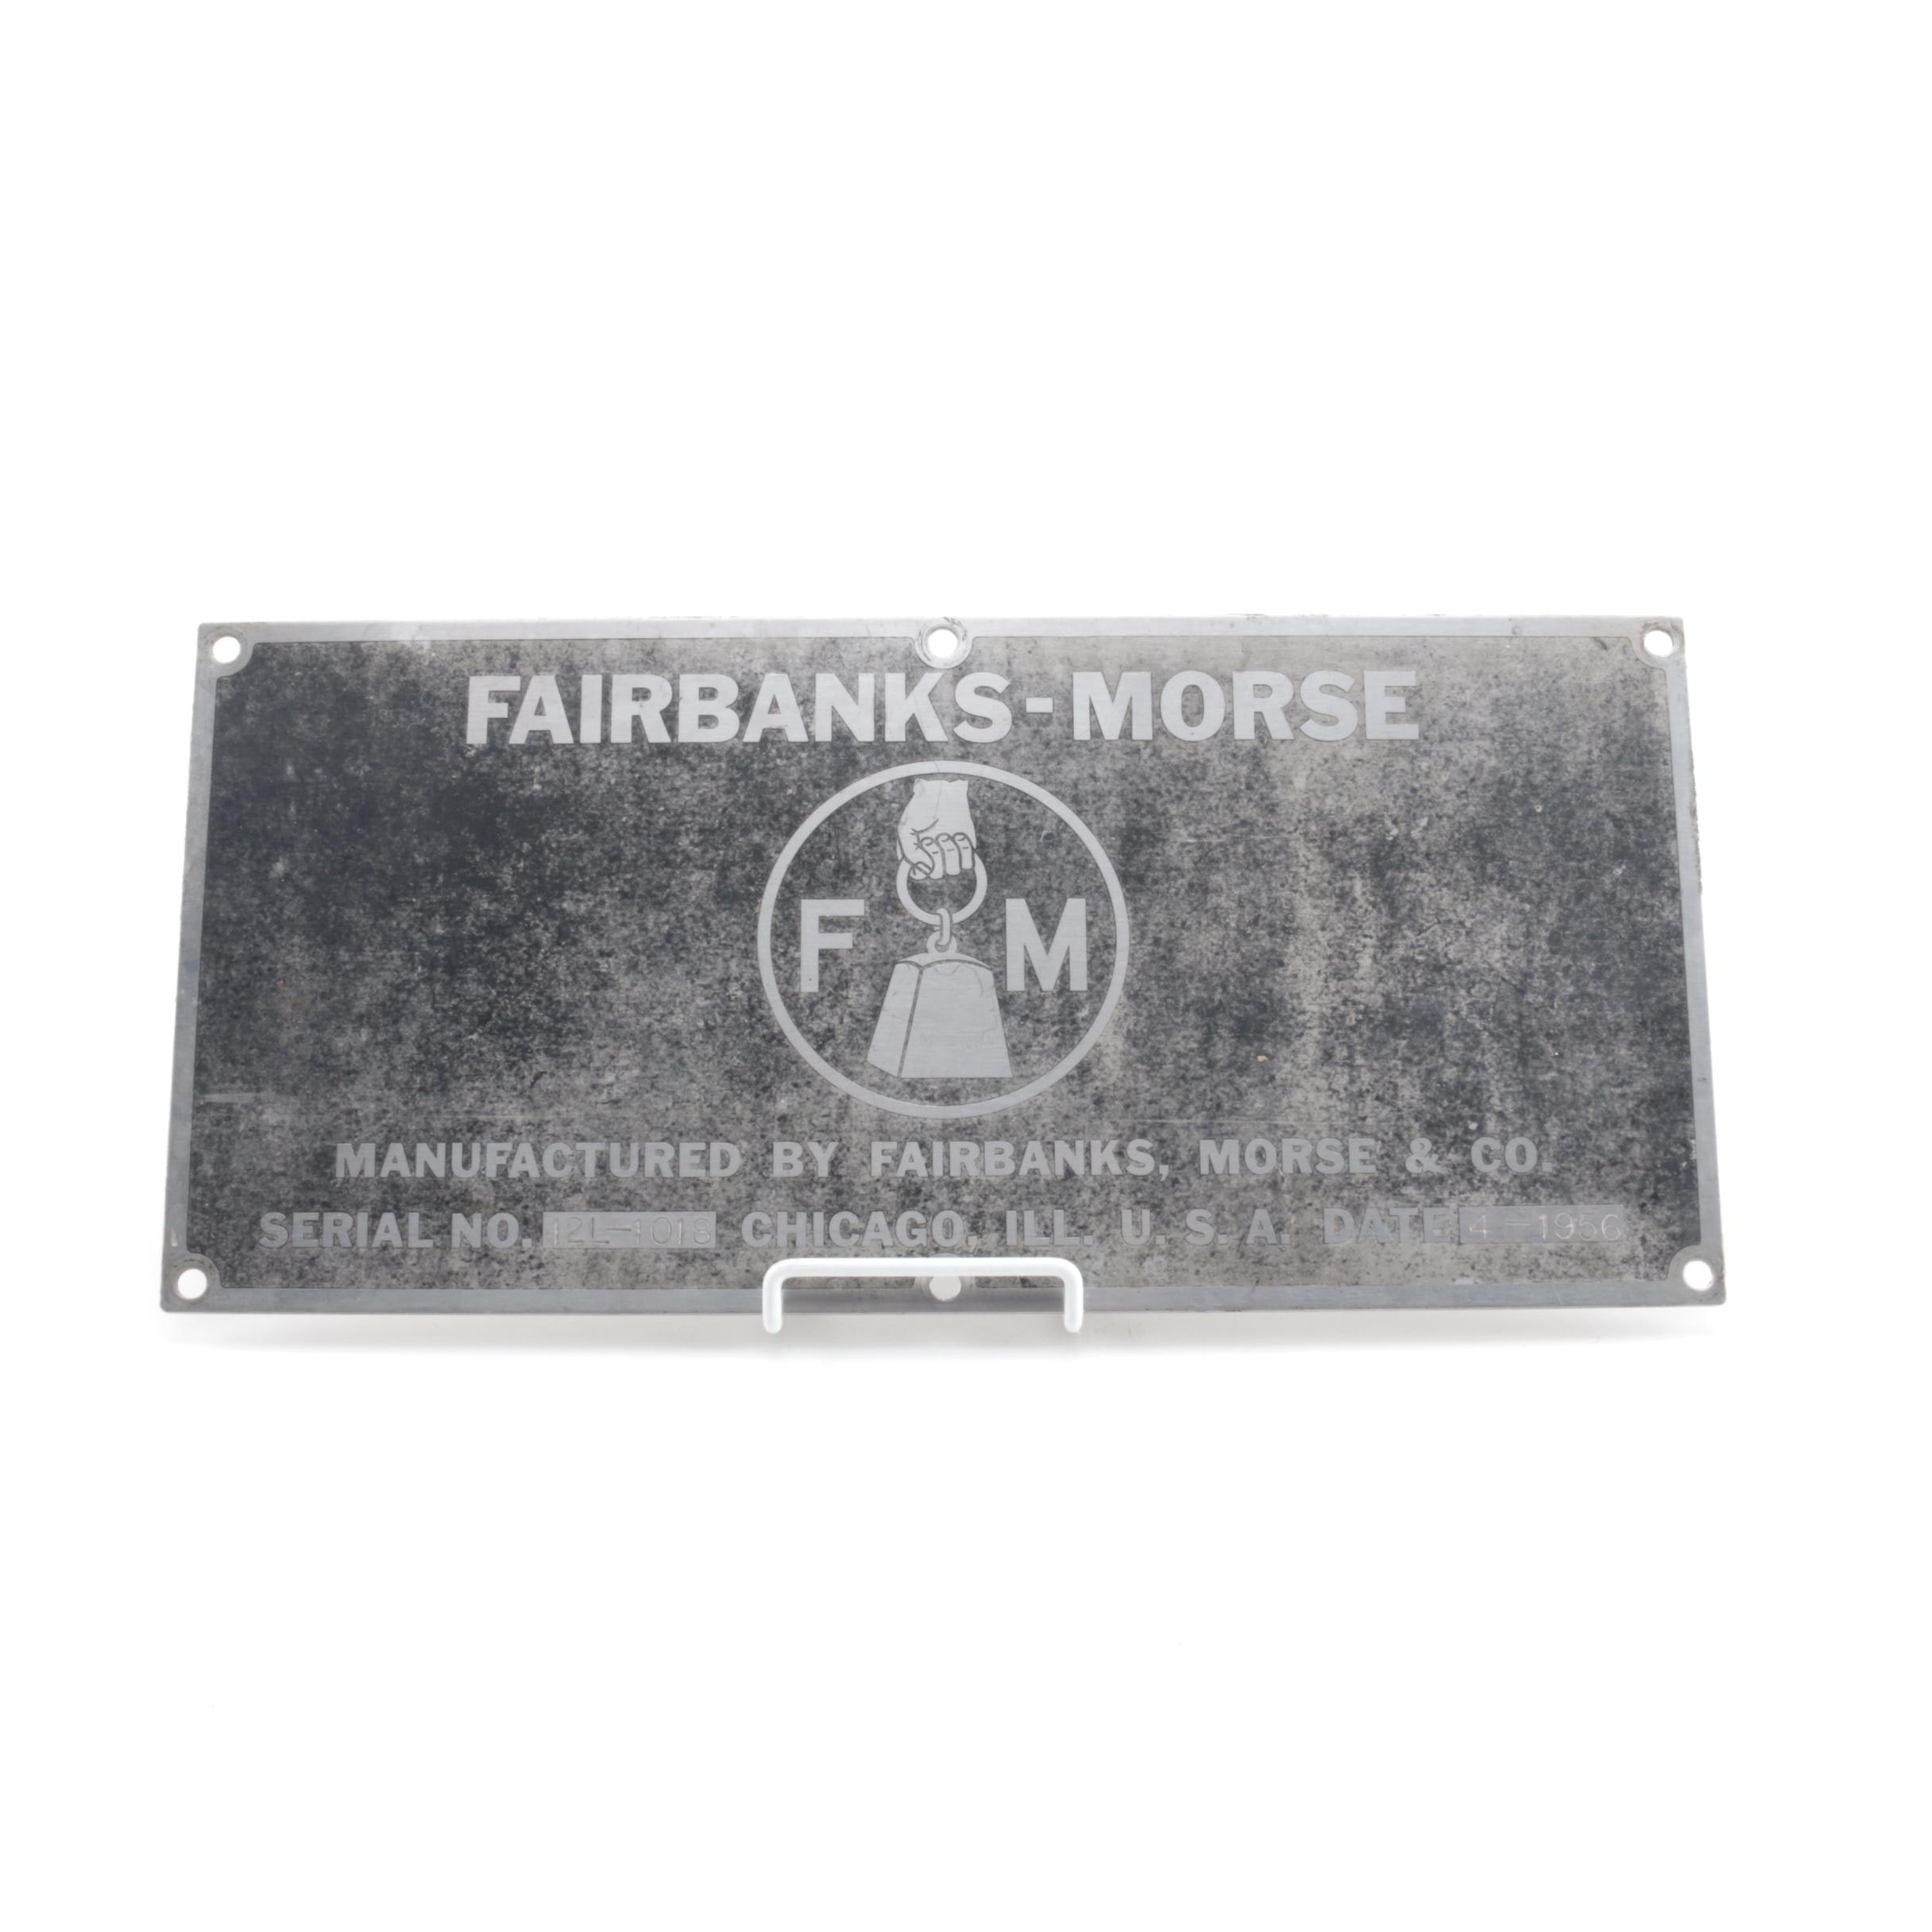 1956 Fairbanks, Morse & Co. Identification Tag, Serial No. 12L-1018